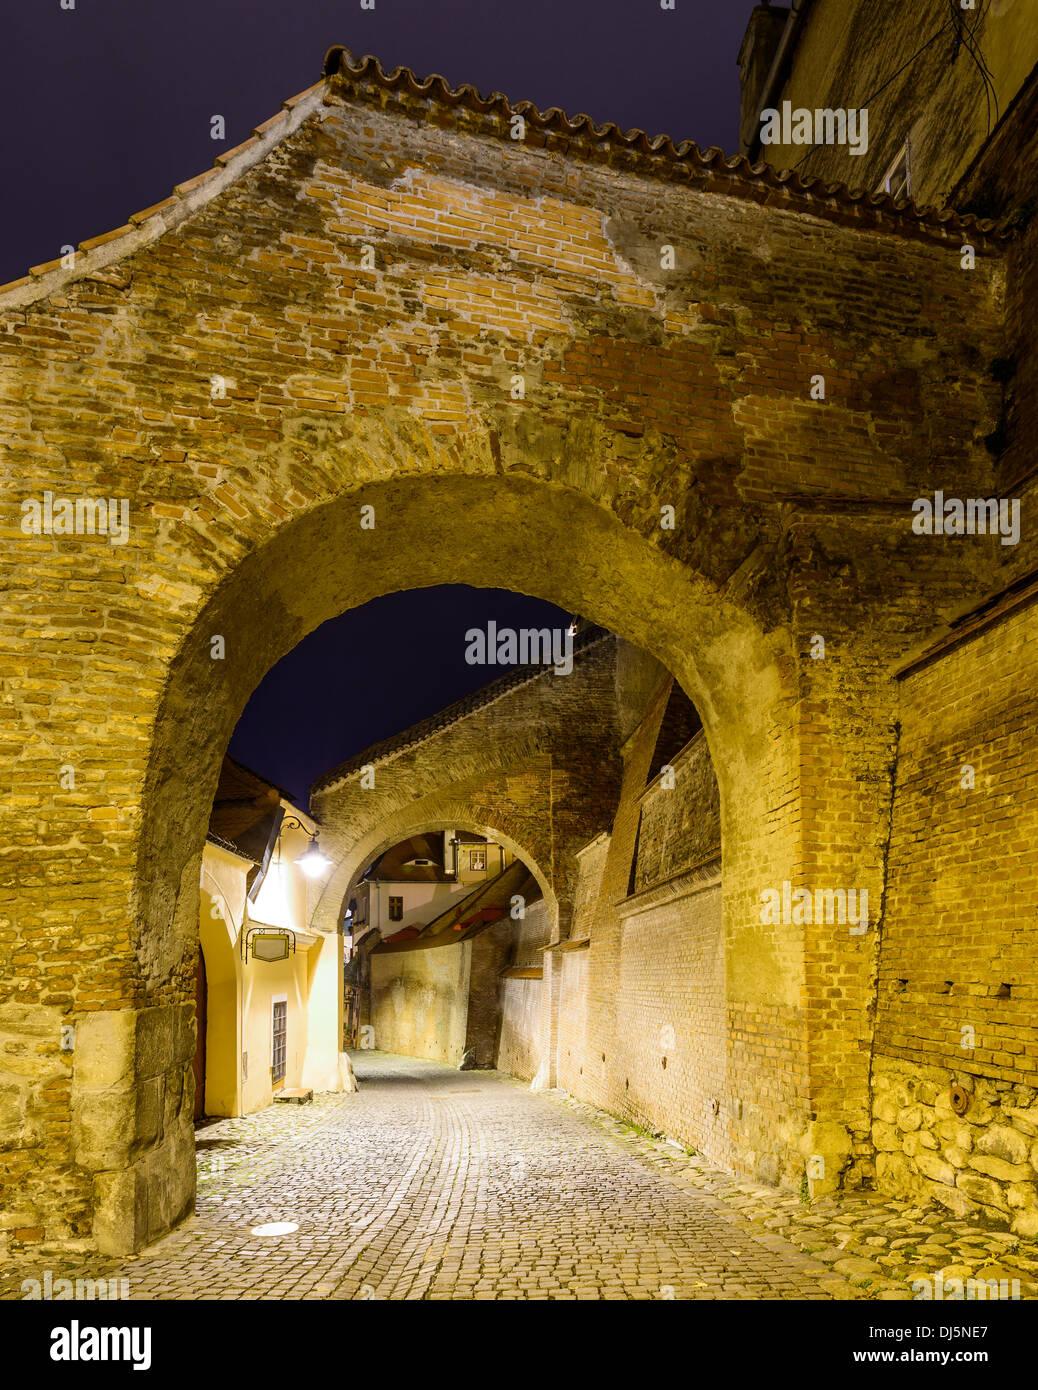 stairs passage in sibiu (hermannstadt), transylvania, romania, at night - Stock Image